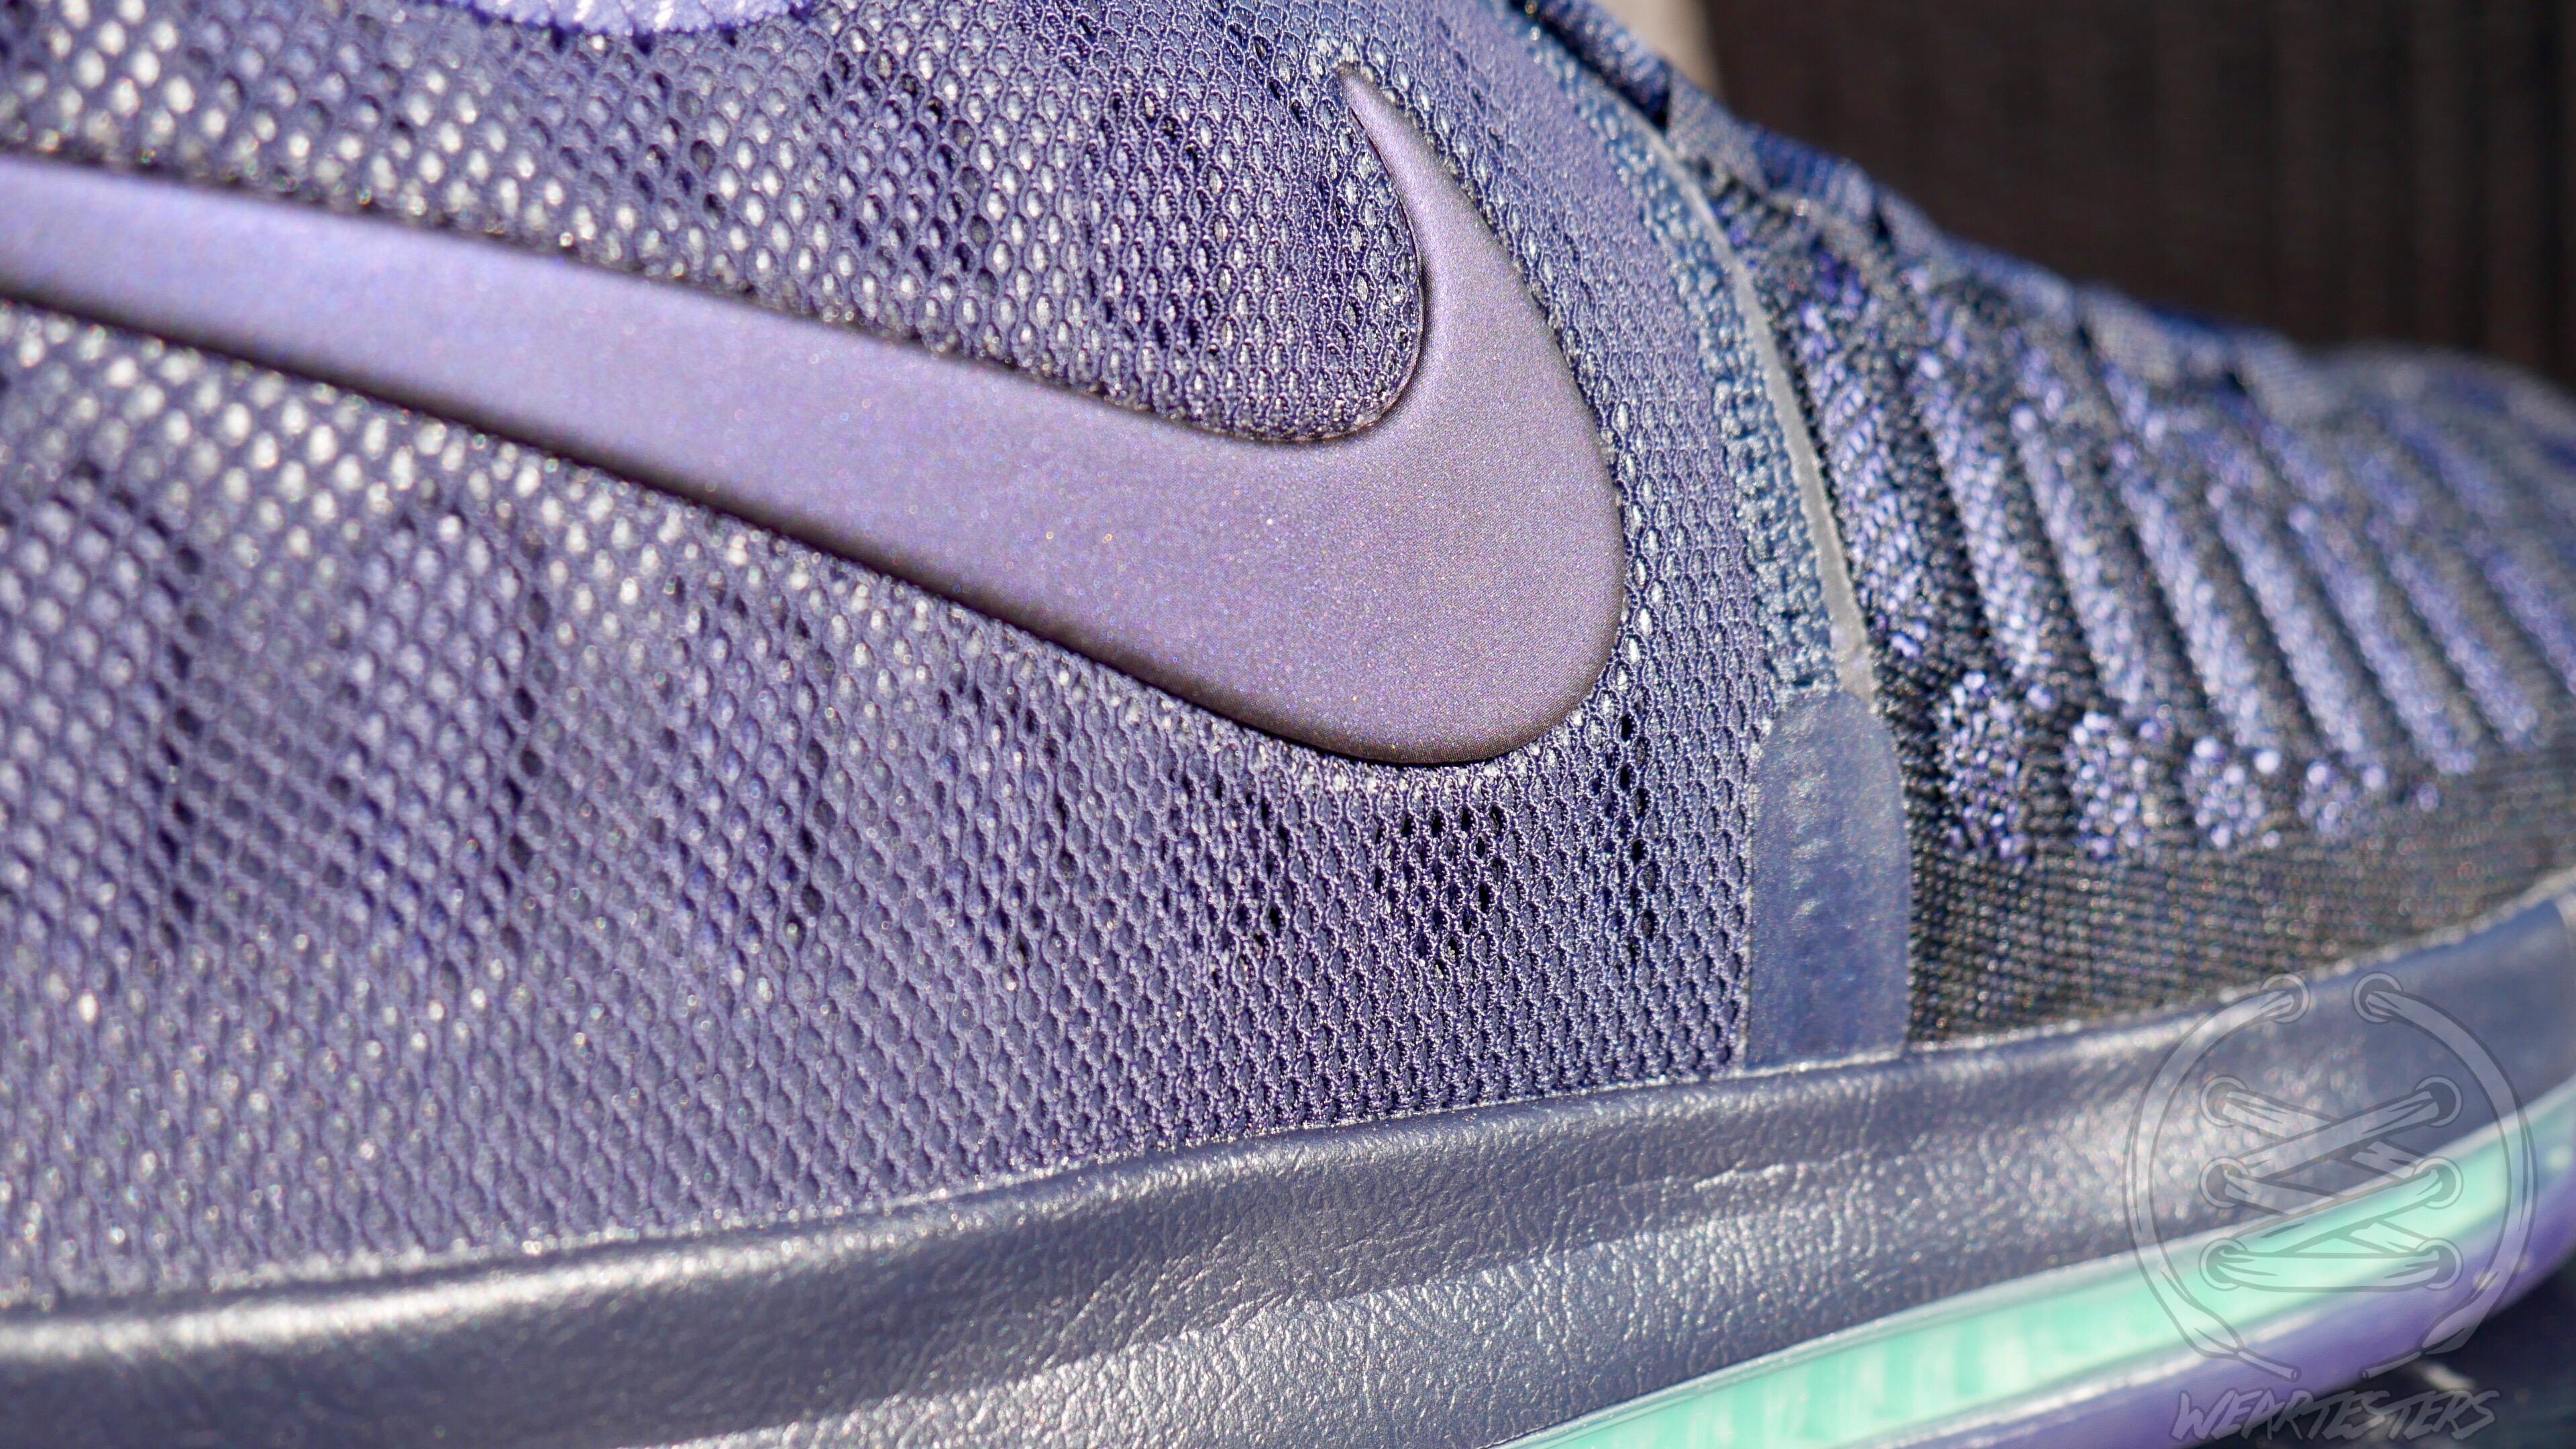 Nike Zoom KD9 Dark Obsidian - Midfoot Fuse